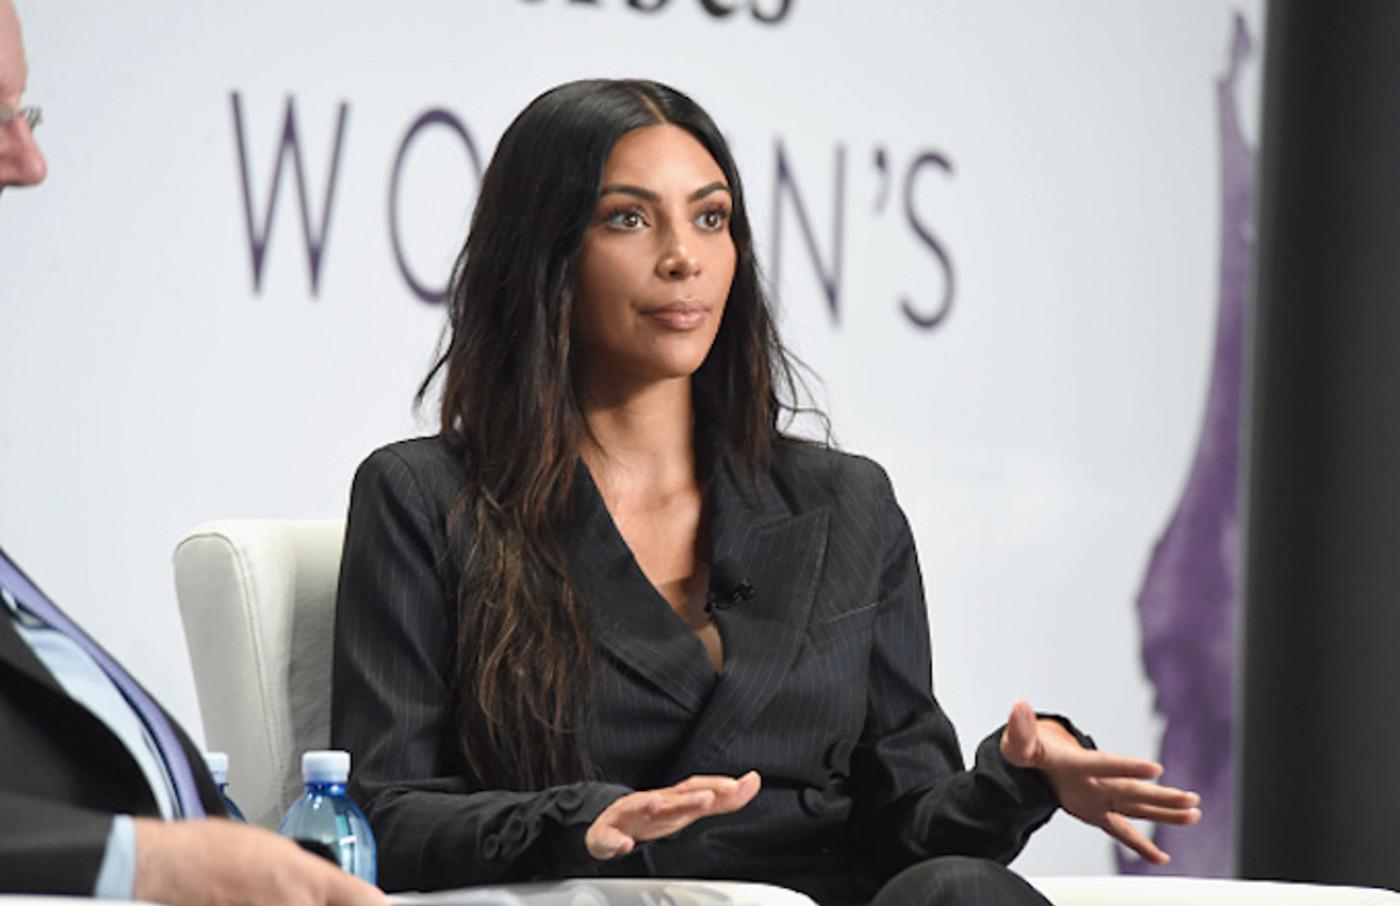 Kim Kardashian West speaks during the the 2017 Forbes Women's Summit